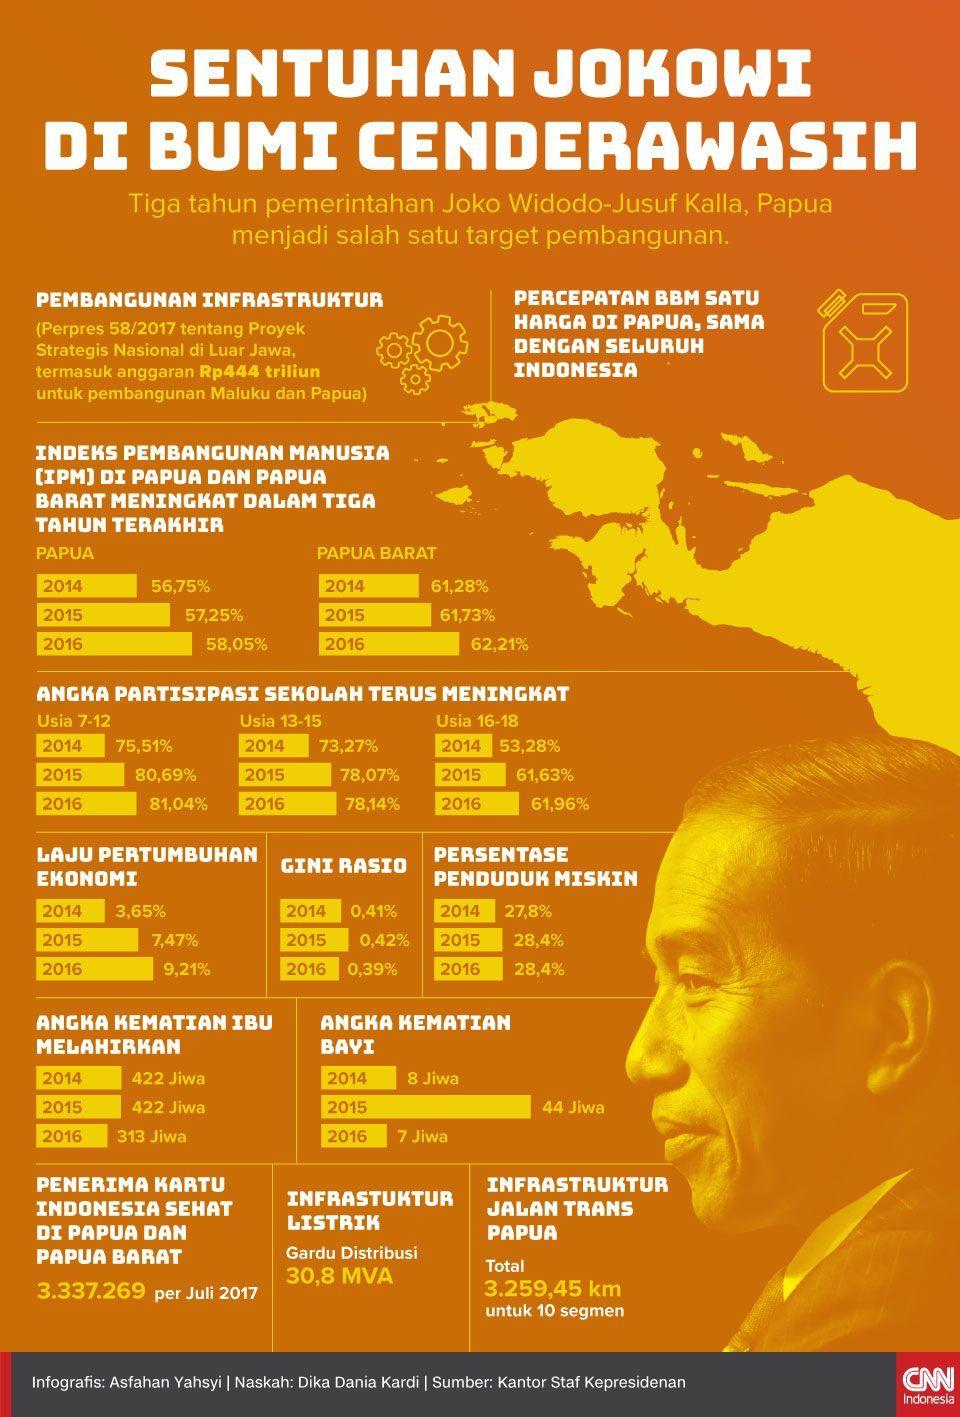 Infografis Sentuhan Jokowi di Papua